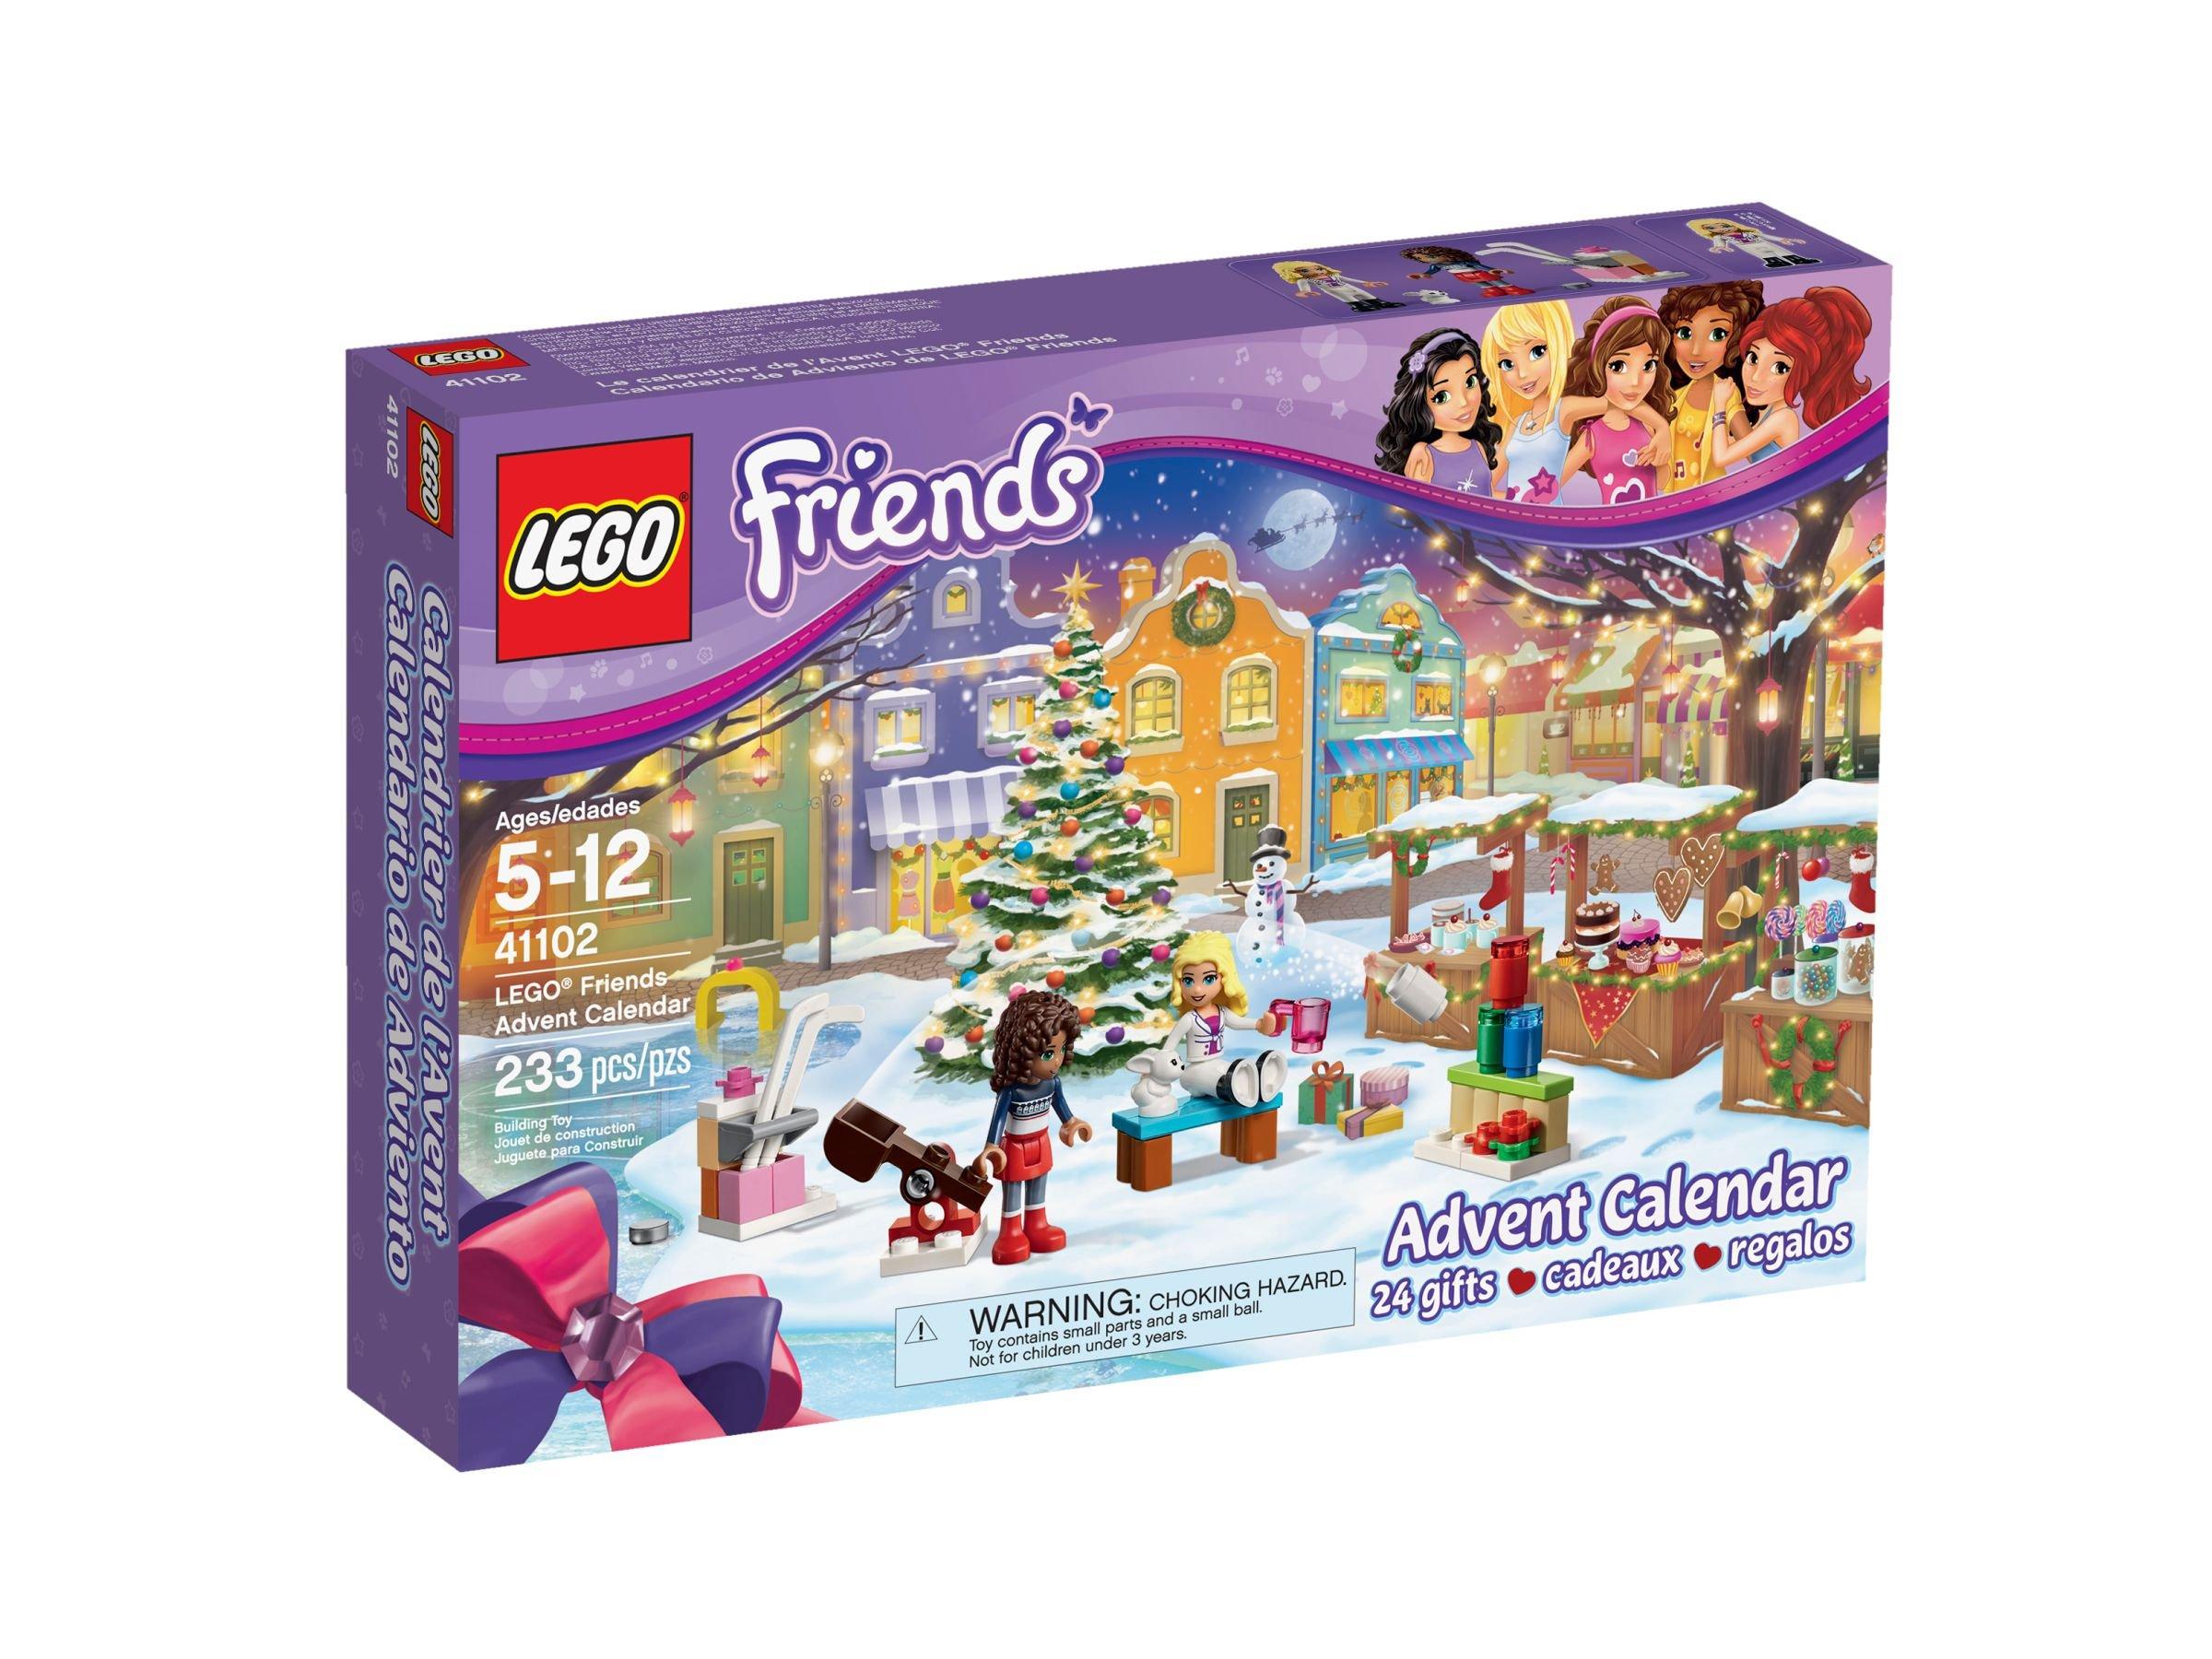 Calendrier Lego Friends 2019.Lego 41102 Lego Friends Adventskalender 2015 2015 Advent Calendar